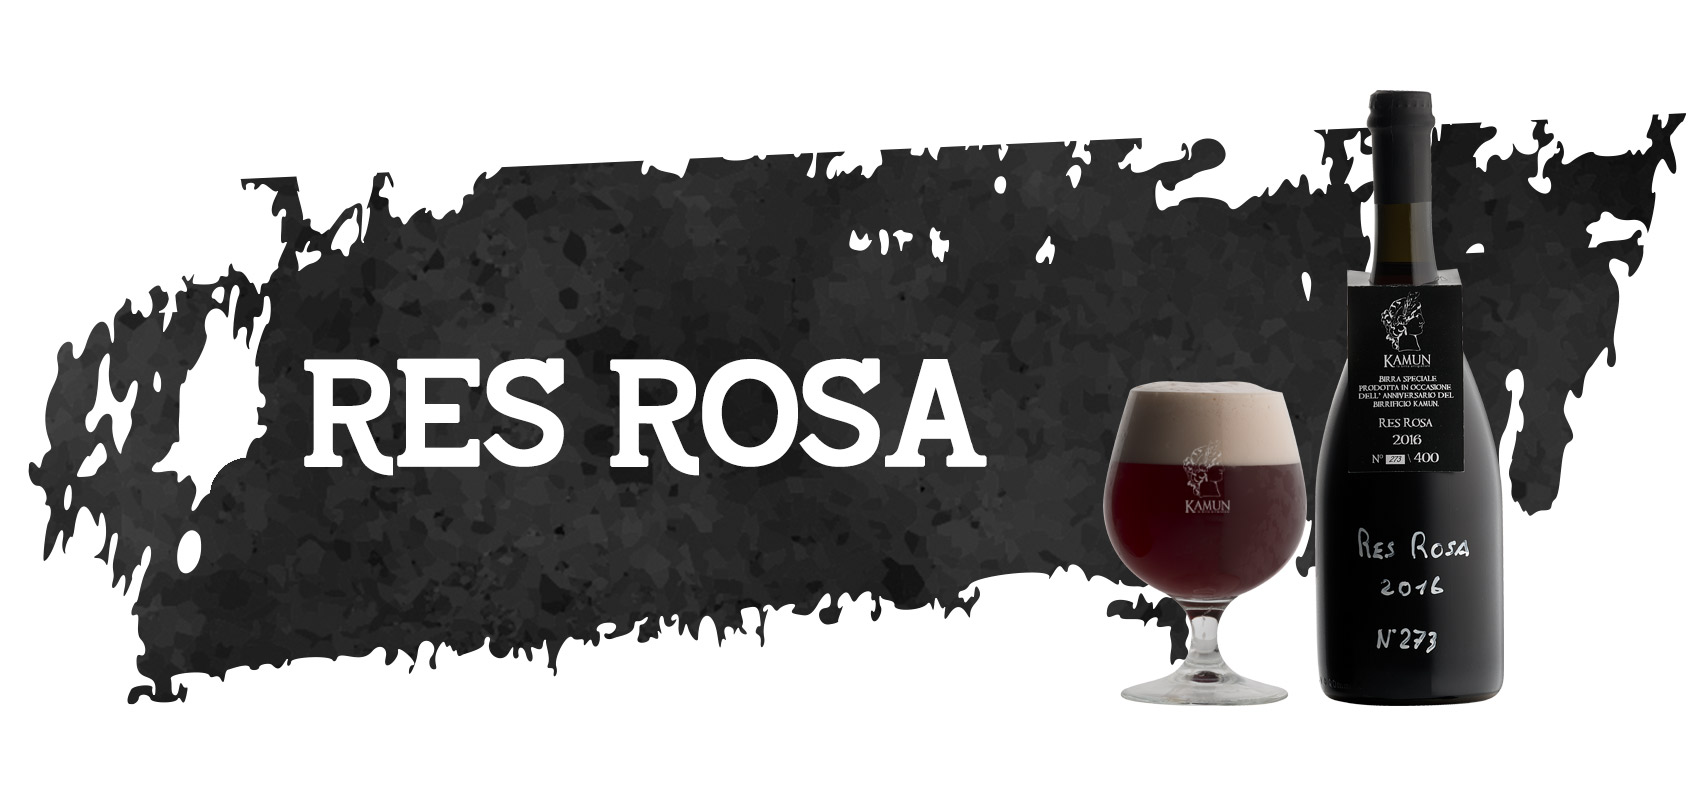 res-rosa-title